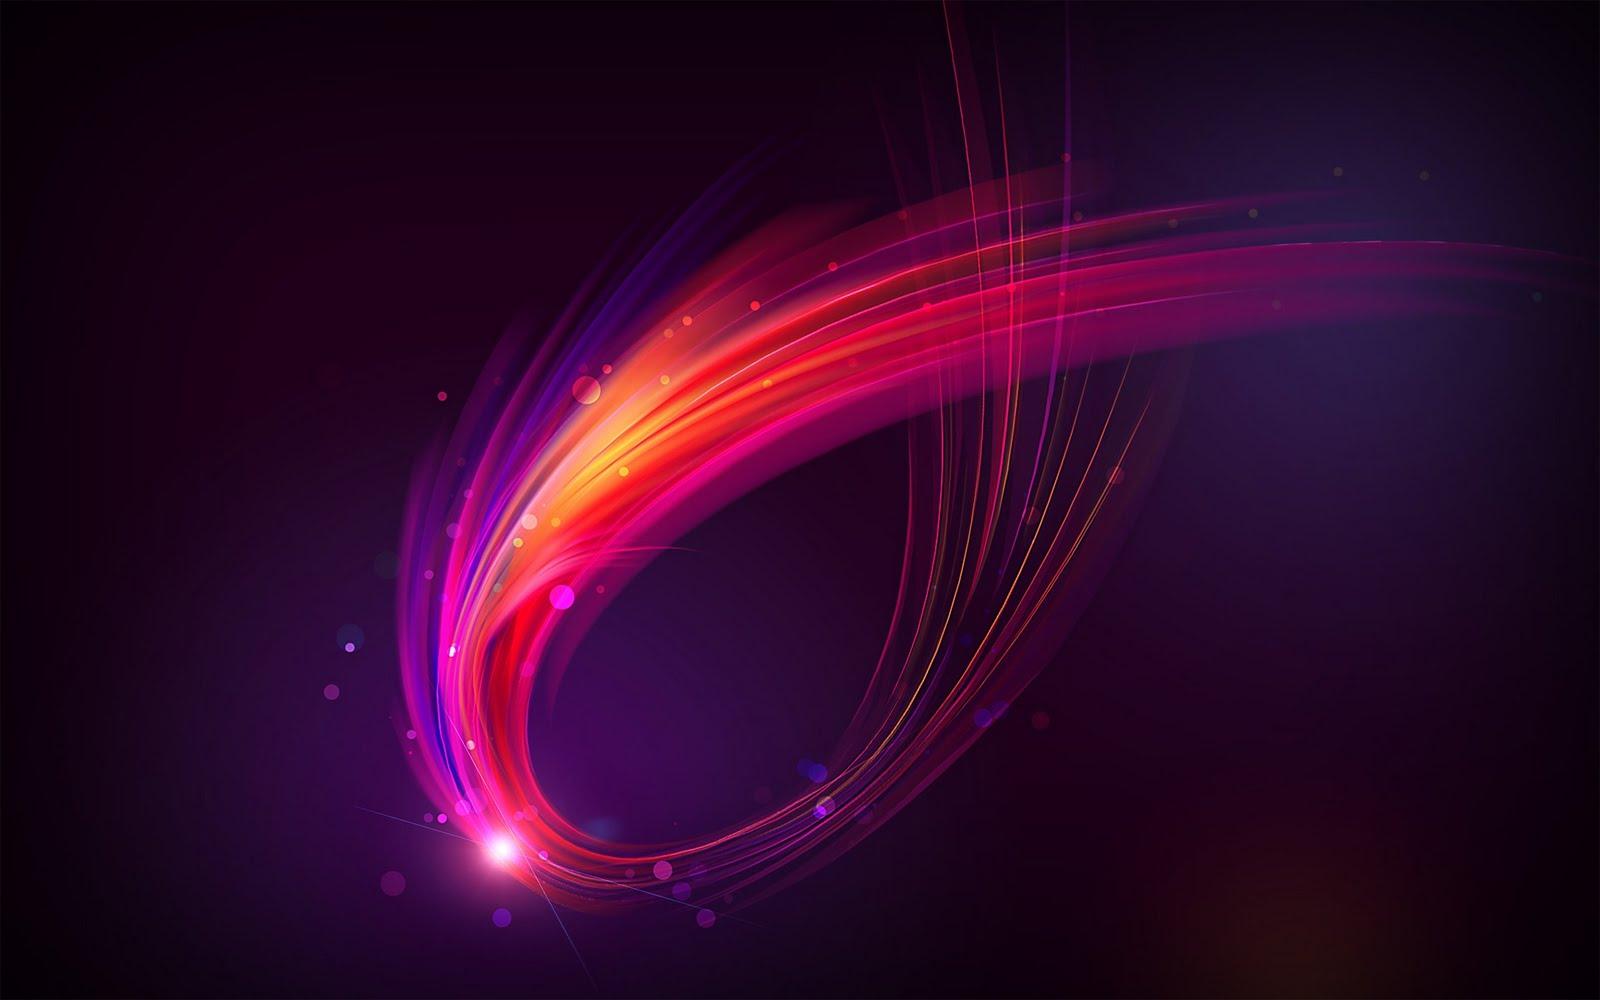 http://3.bp.blogspot.com/-6gEqOCZyvtw/TnPREwxGCNI/AAAAAAAAAdw/7Qo9_vV2R54/s1600/Abstract%20Art%20Vector%20Lines%20-%20PremiumWallpapersHD.Blogspot.Com.jpg